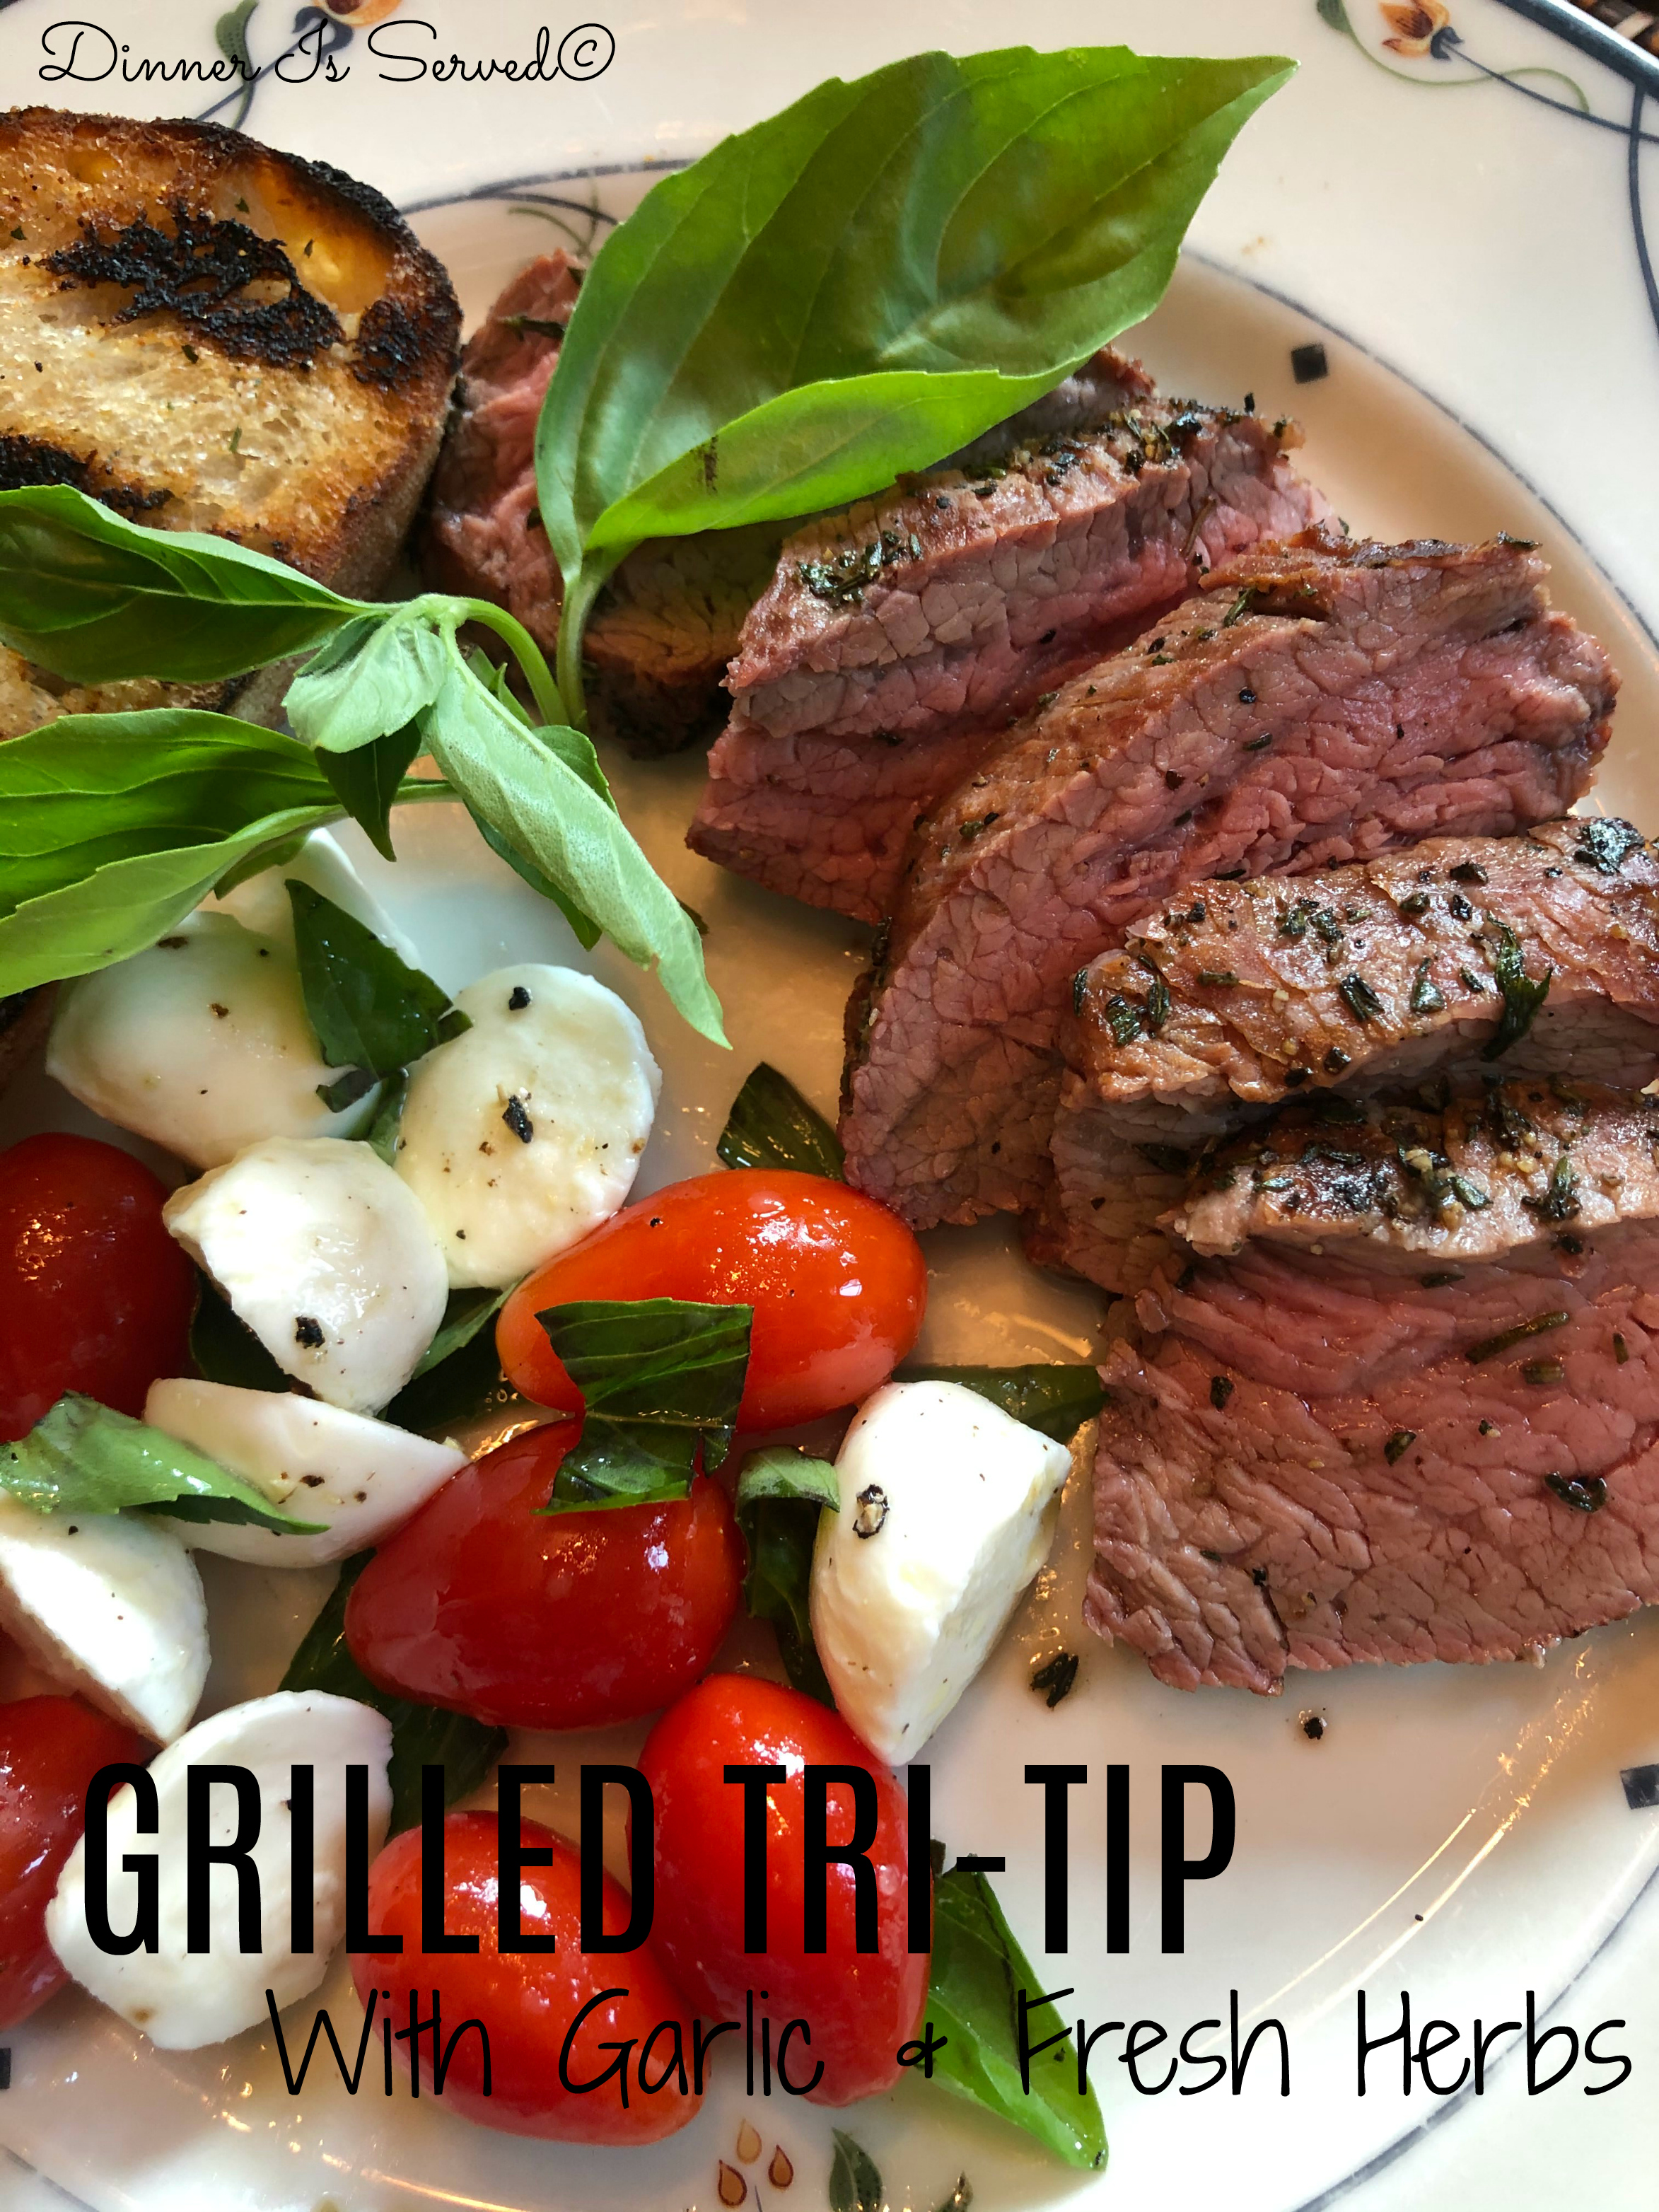 Garlic & Herb Tri-Tip_Dinner Is Served